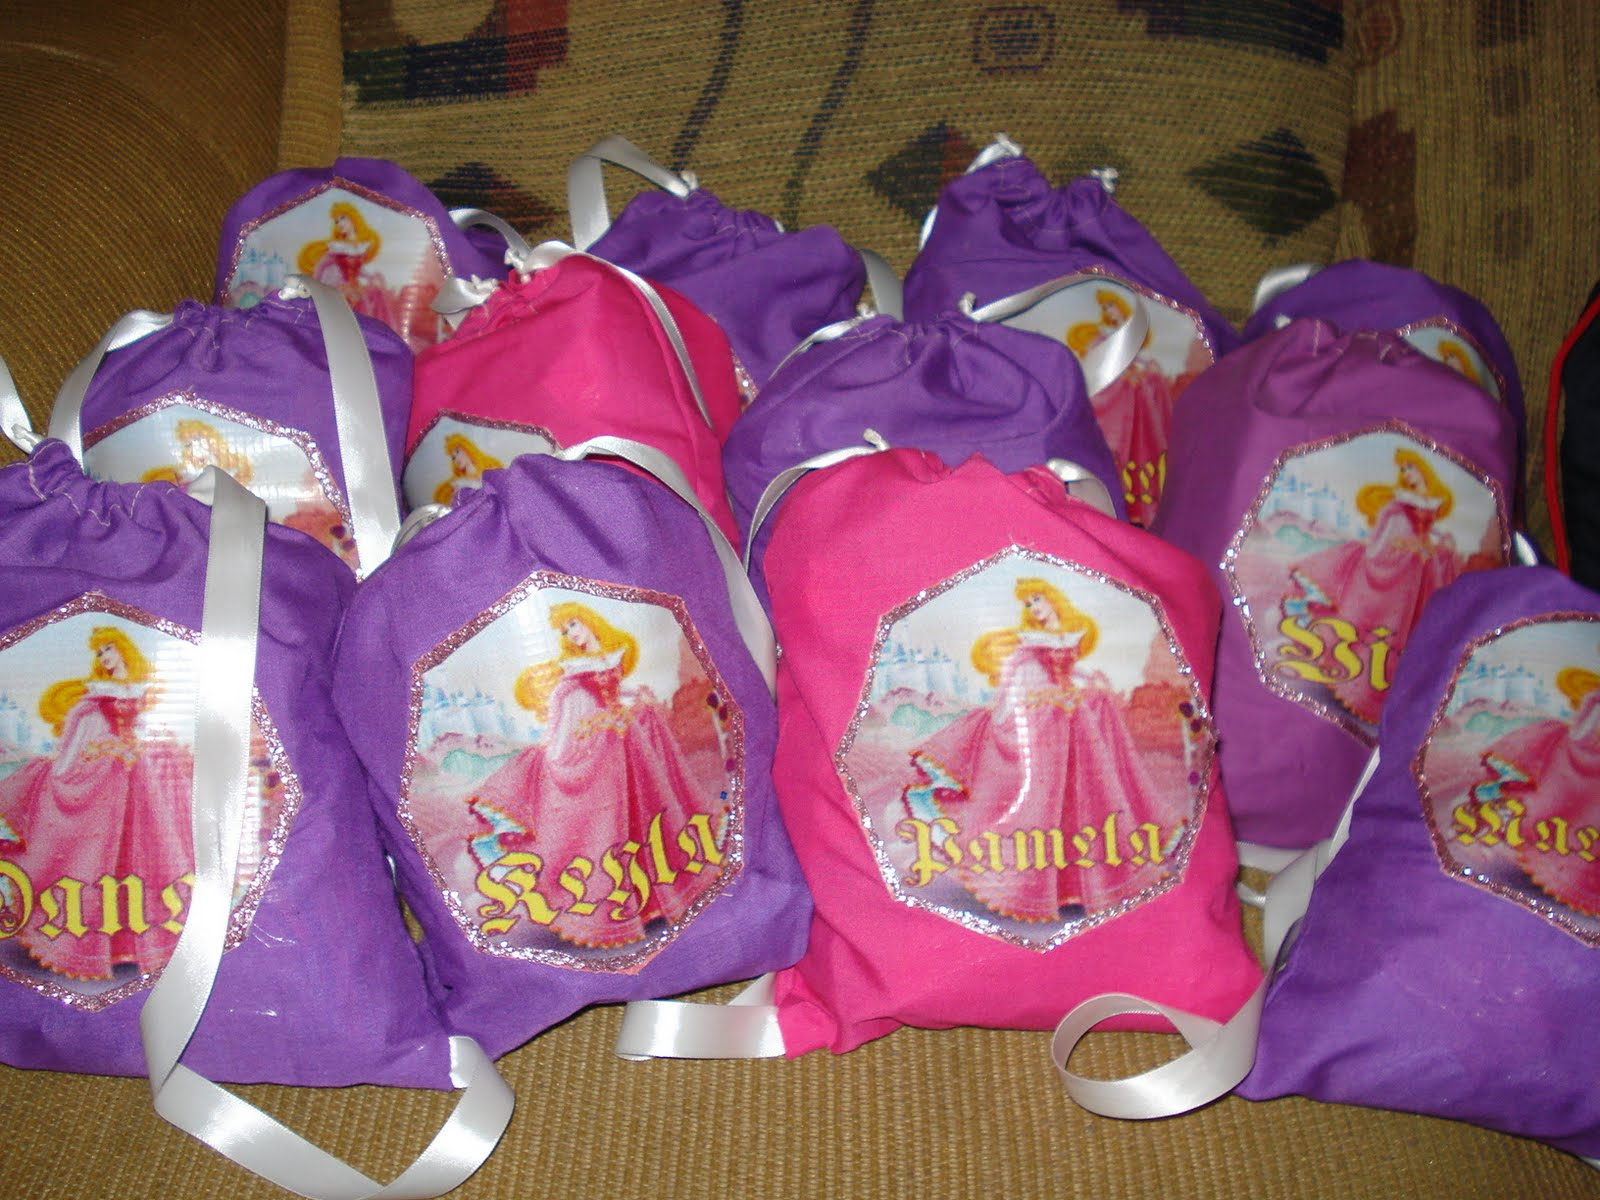 Princesa aurora para cumpleanos 28 decoracion de - Decoracion cumpleanos princesas ...